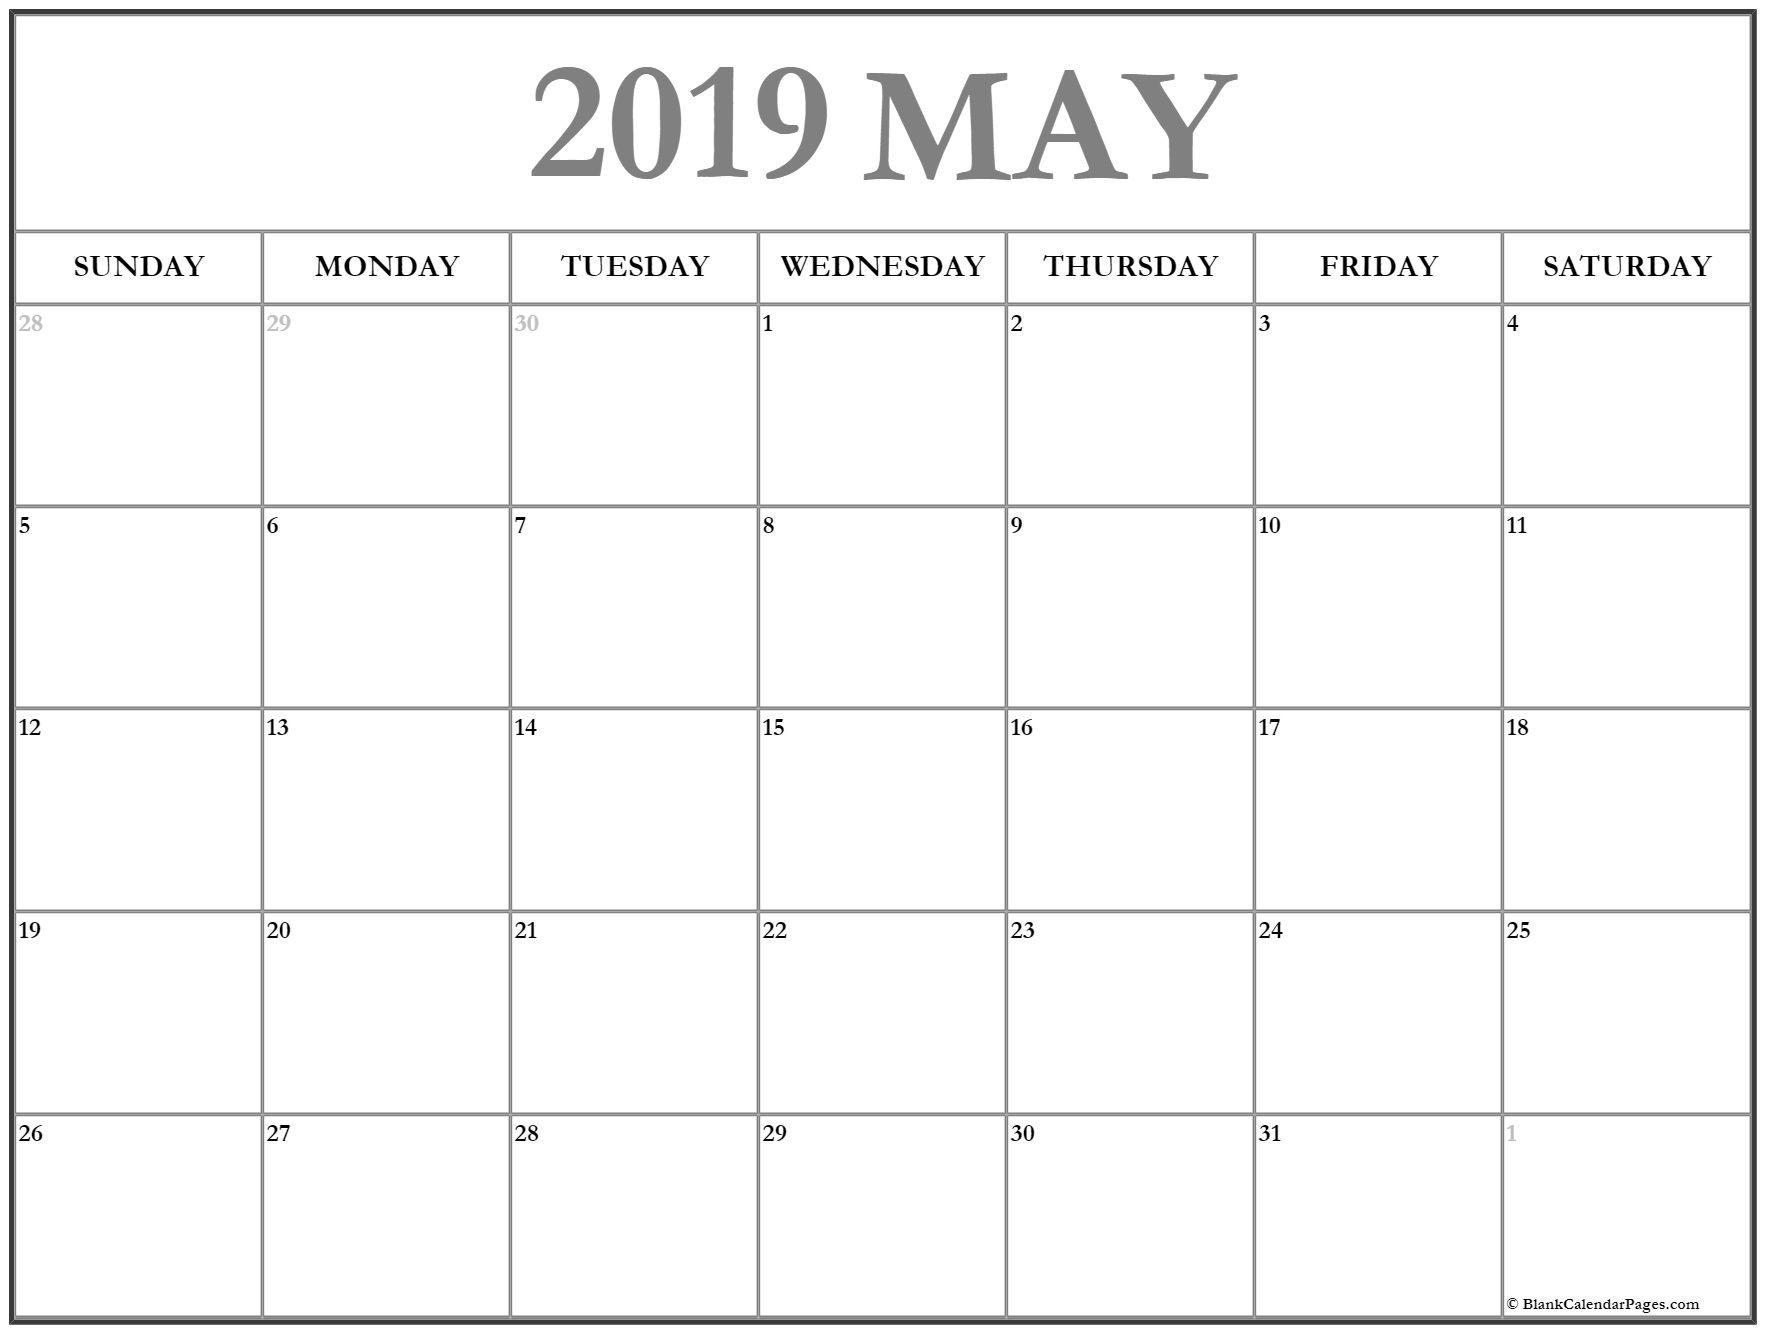 Calendario 2019 Argentina Para Imprimir Excel Recientes May 2019 Calendar May Calendar 2019 Printable and Free Blank Of Calendario 2019 Argentina Para Imprimir Excel Más Arriba-a-fecha formato De Calendarios Kordurorddiner